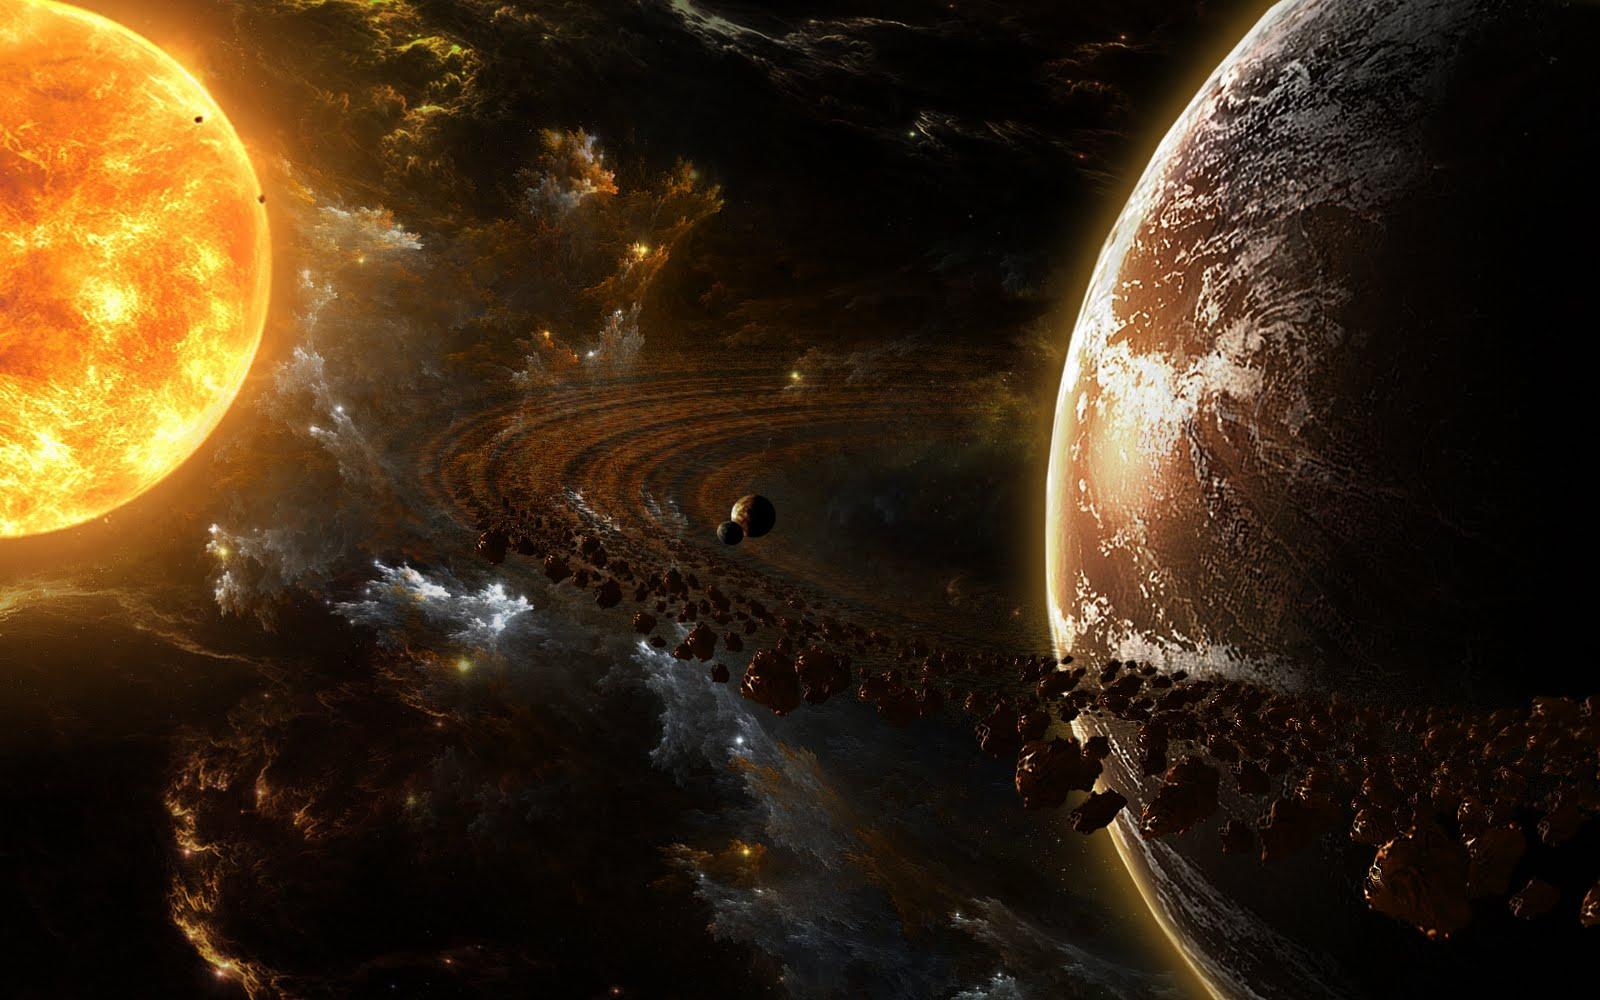 http://2.bp.blogspot.com/-iPQtUfeC4fE/TsqyCnTjbYI/AAAAAAAAAeE/FPcWie5tODk/s1600/exoplanet2-2.jpg